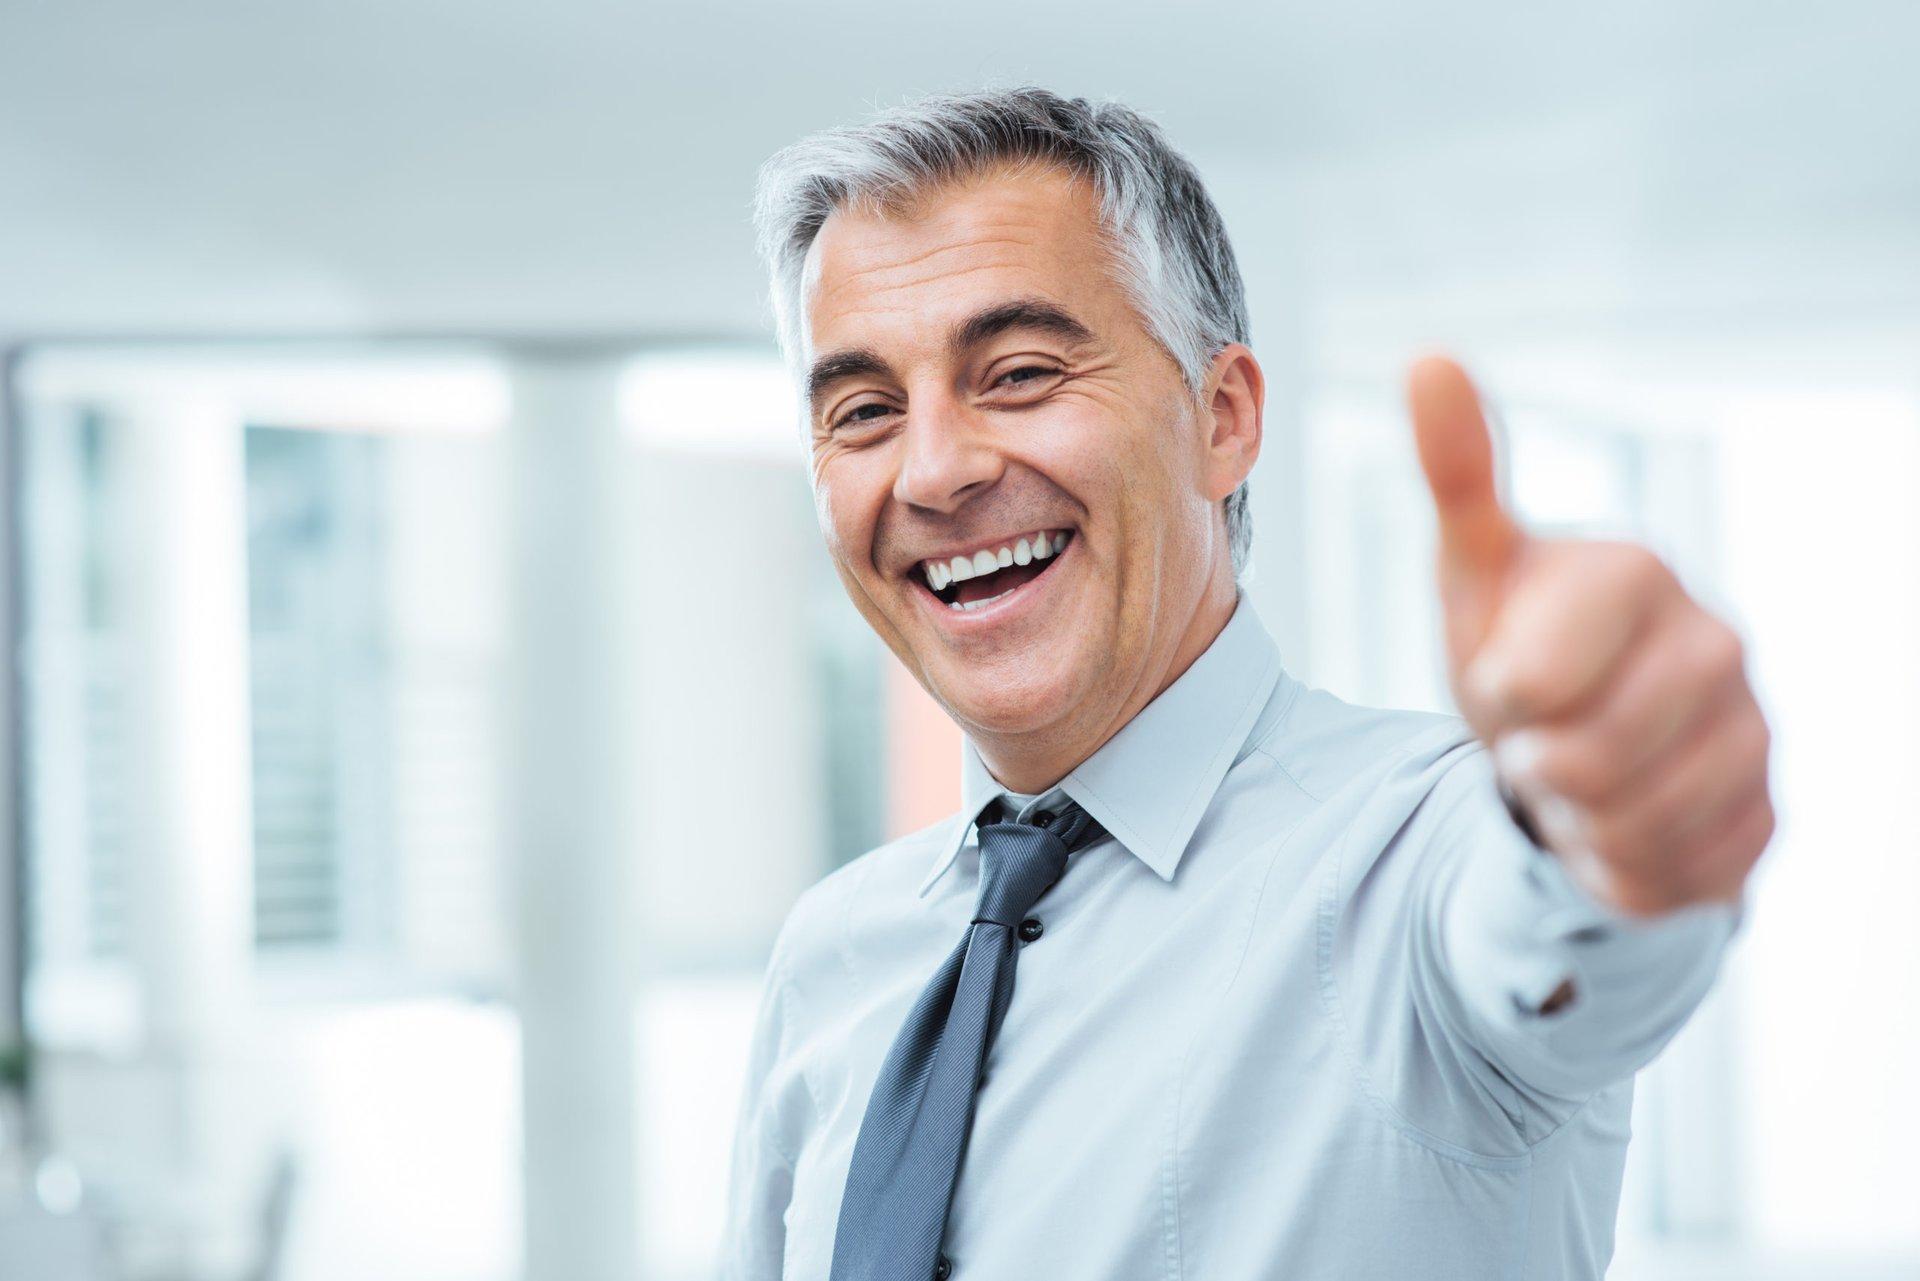 An older businessman gestures thumbs up